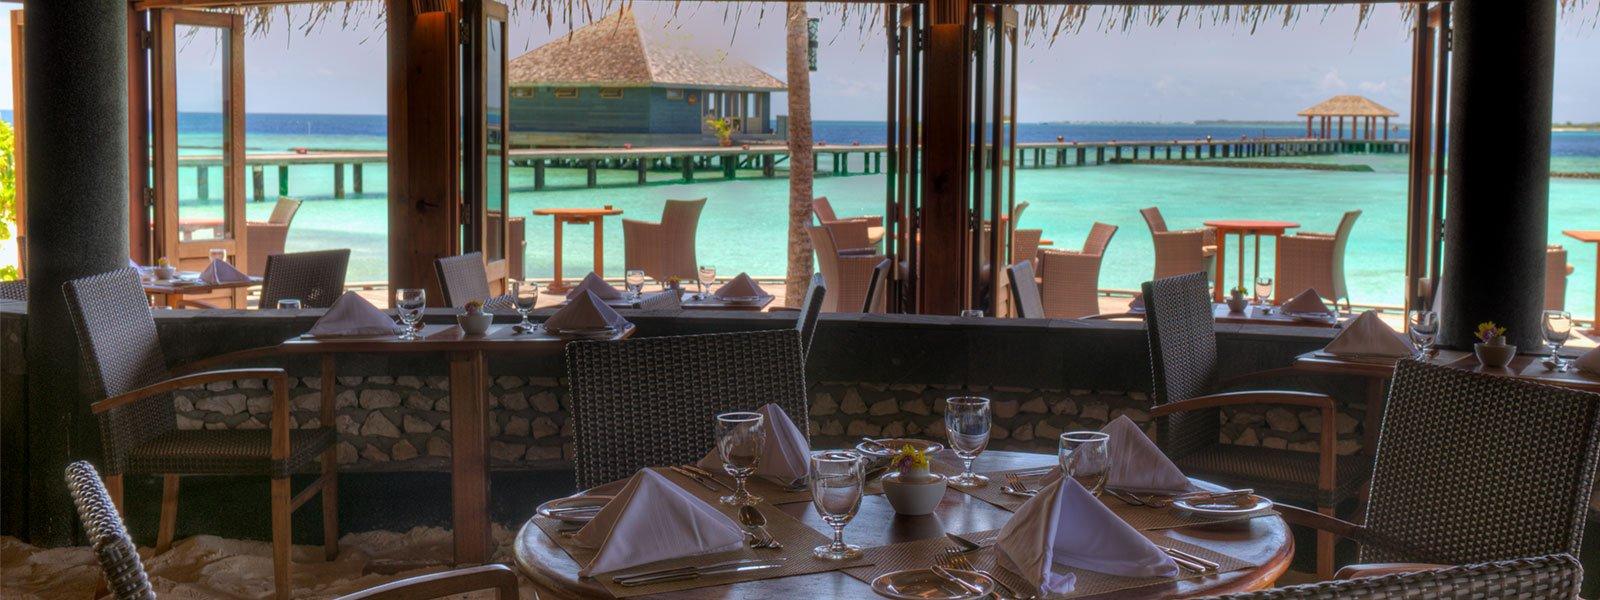 komandoo-restaurants-falhu_1600x600